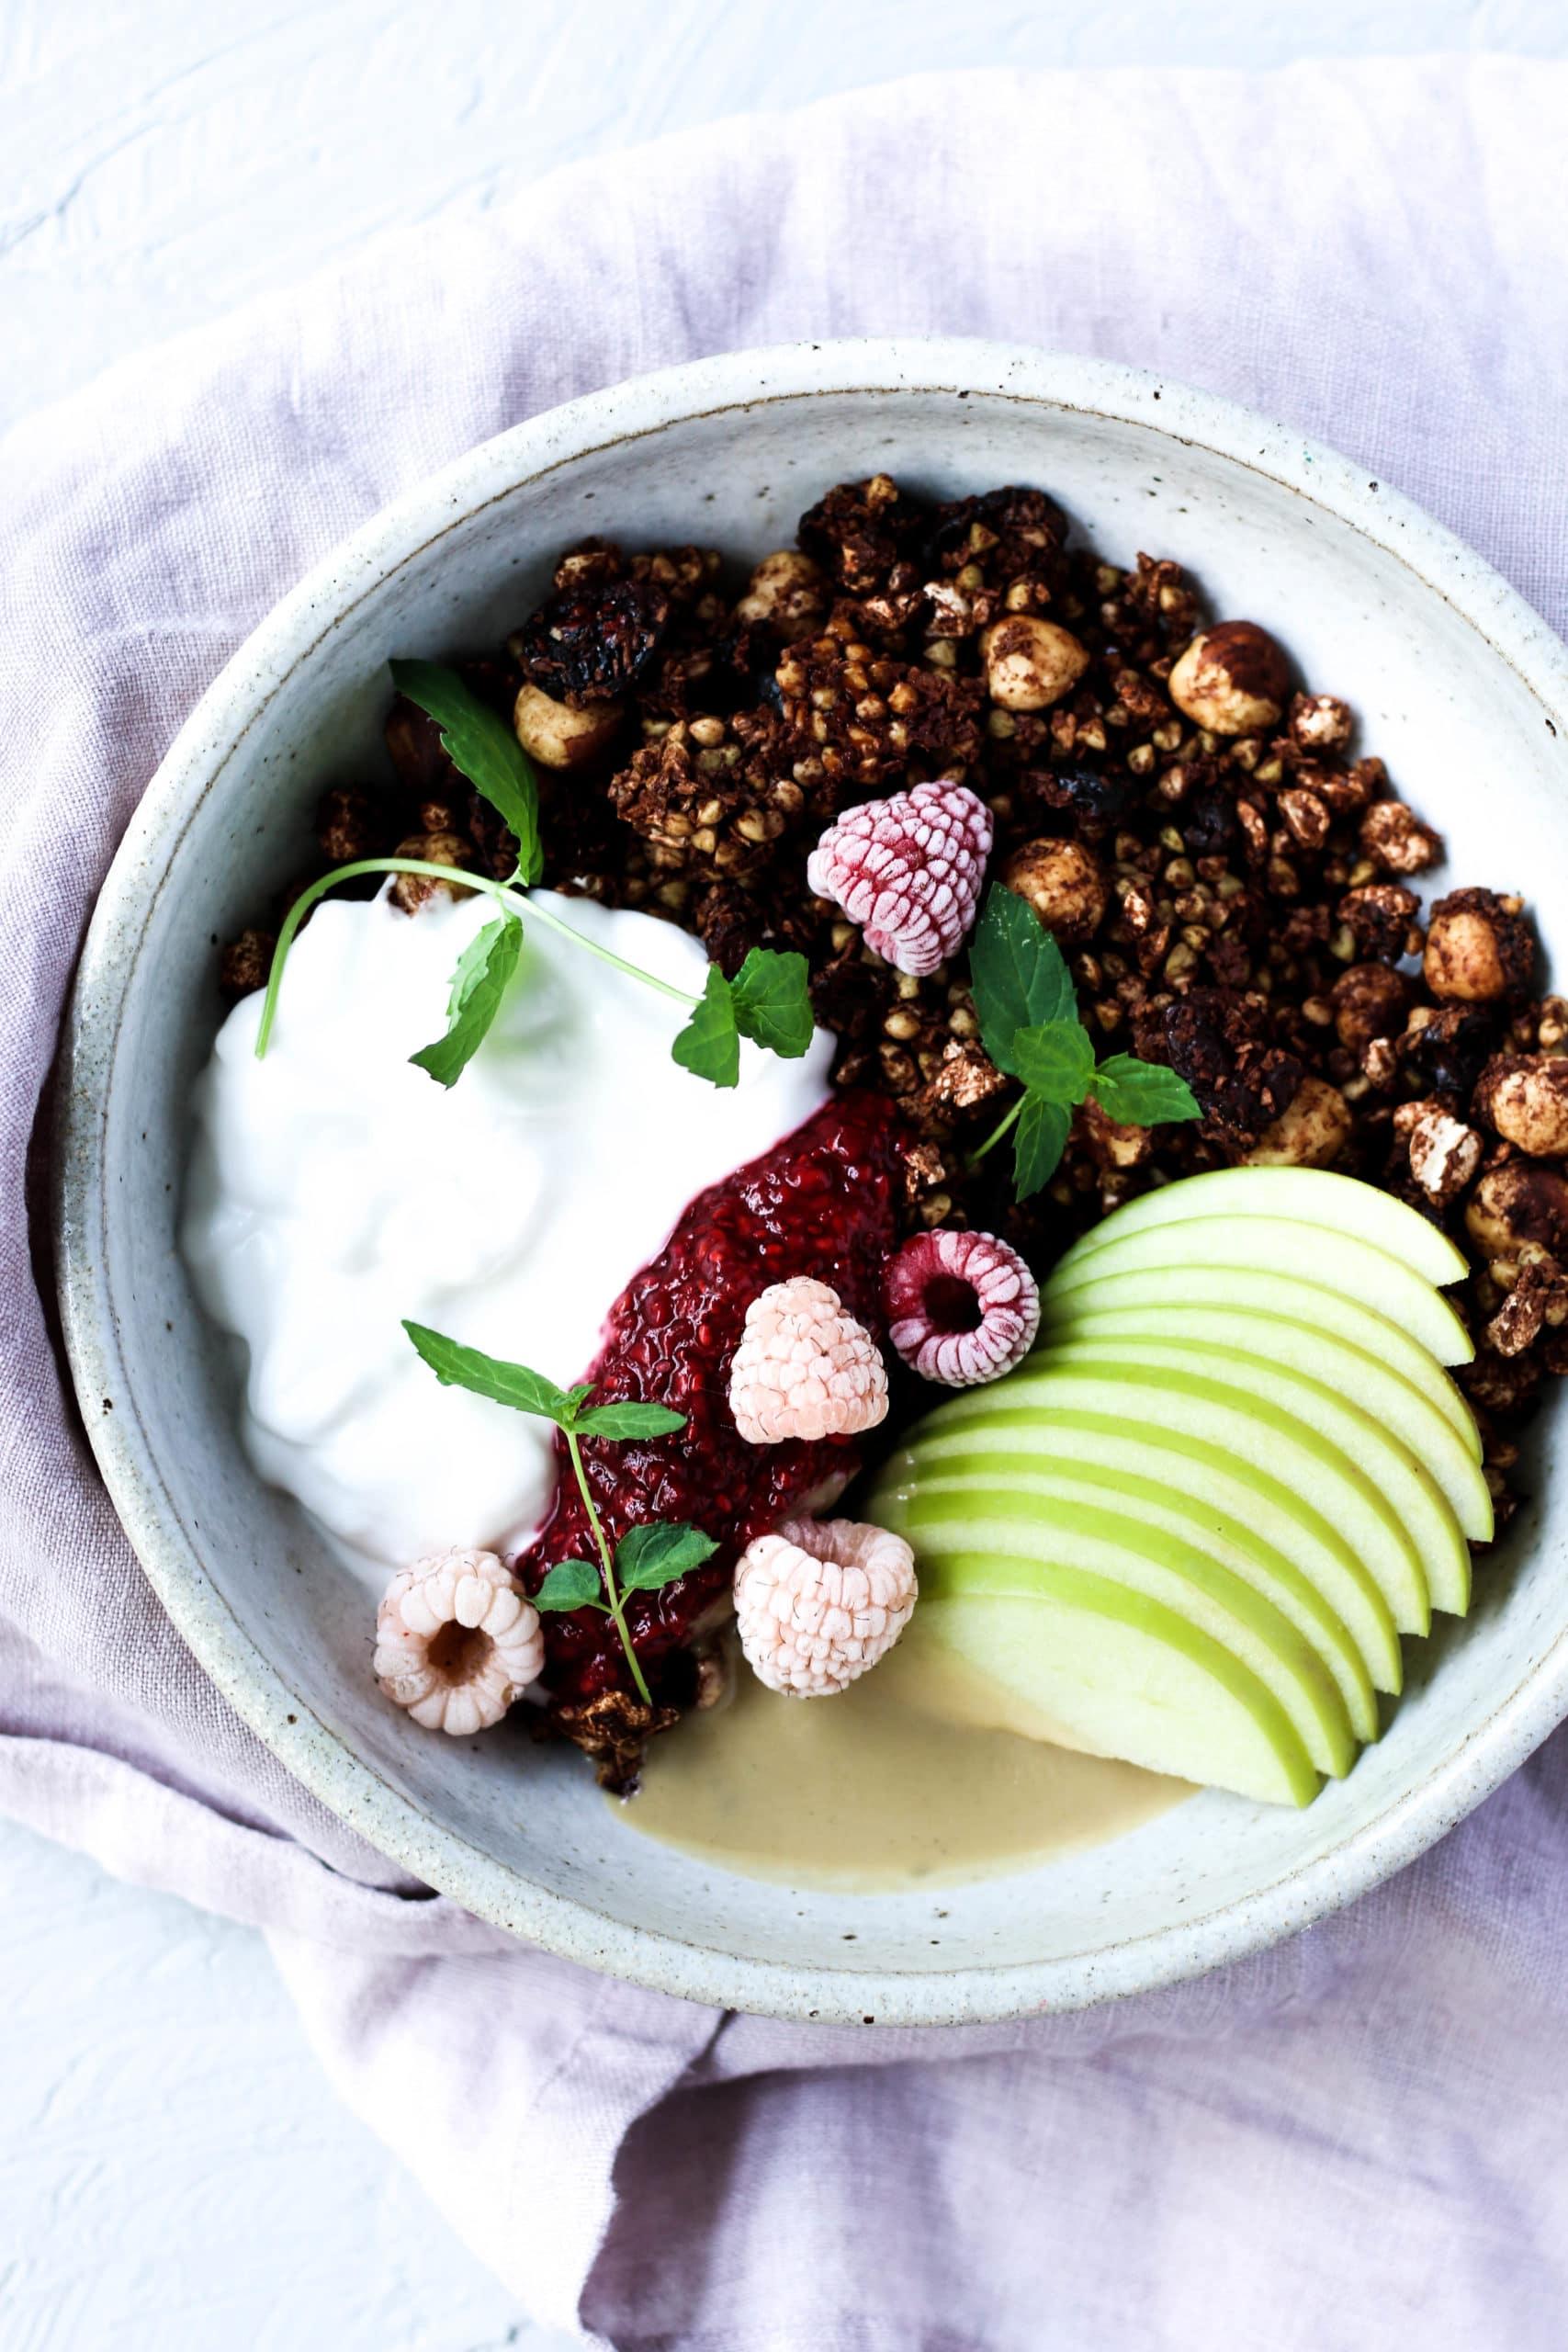 healthy breakfast, vegan recipes, vegan breakfast, gluten free granola recipe, chocolate granola recipe